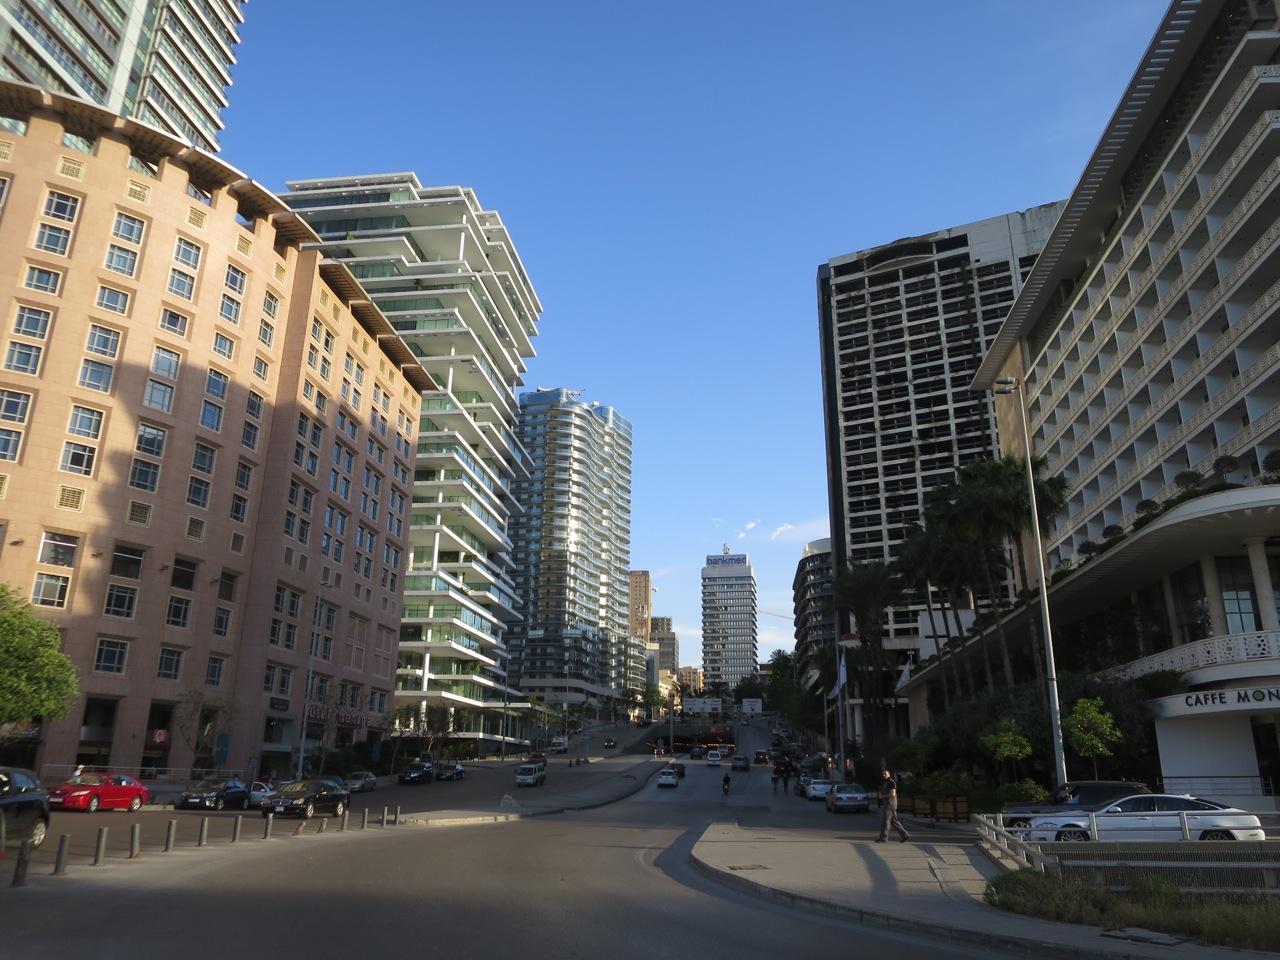 Beirute 2-03